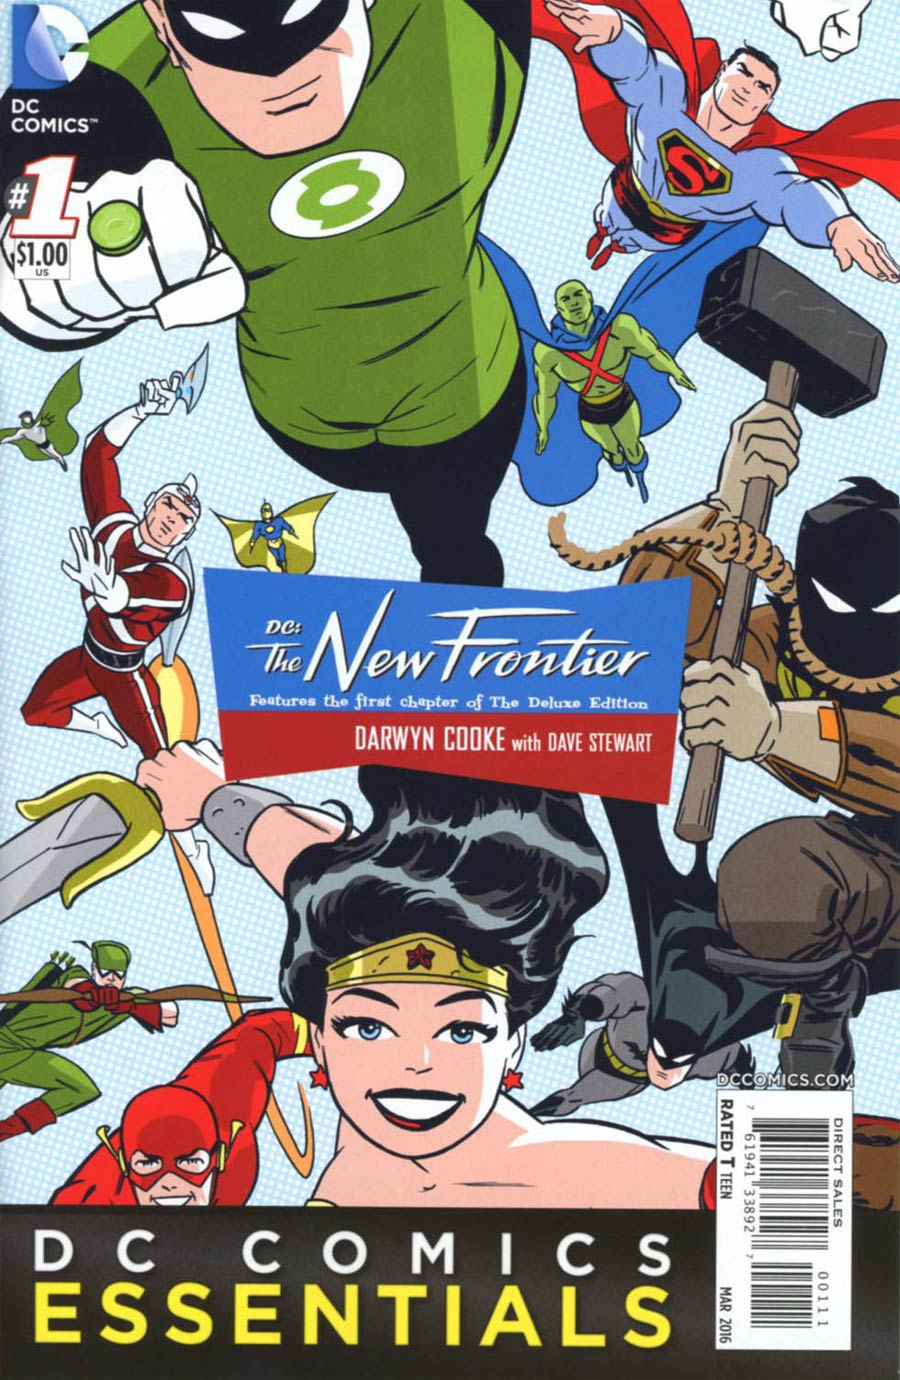 DC Essentials DC The New Frontier #1